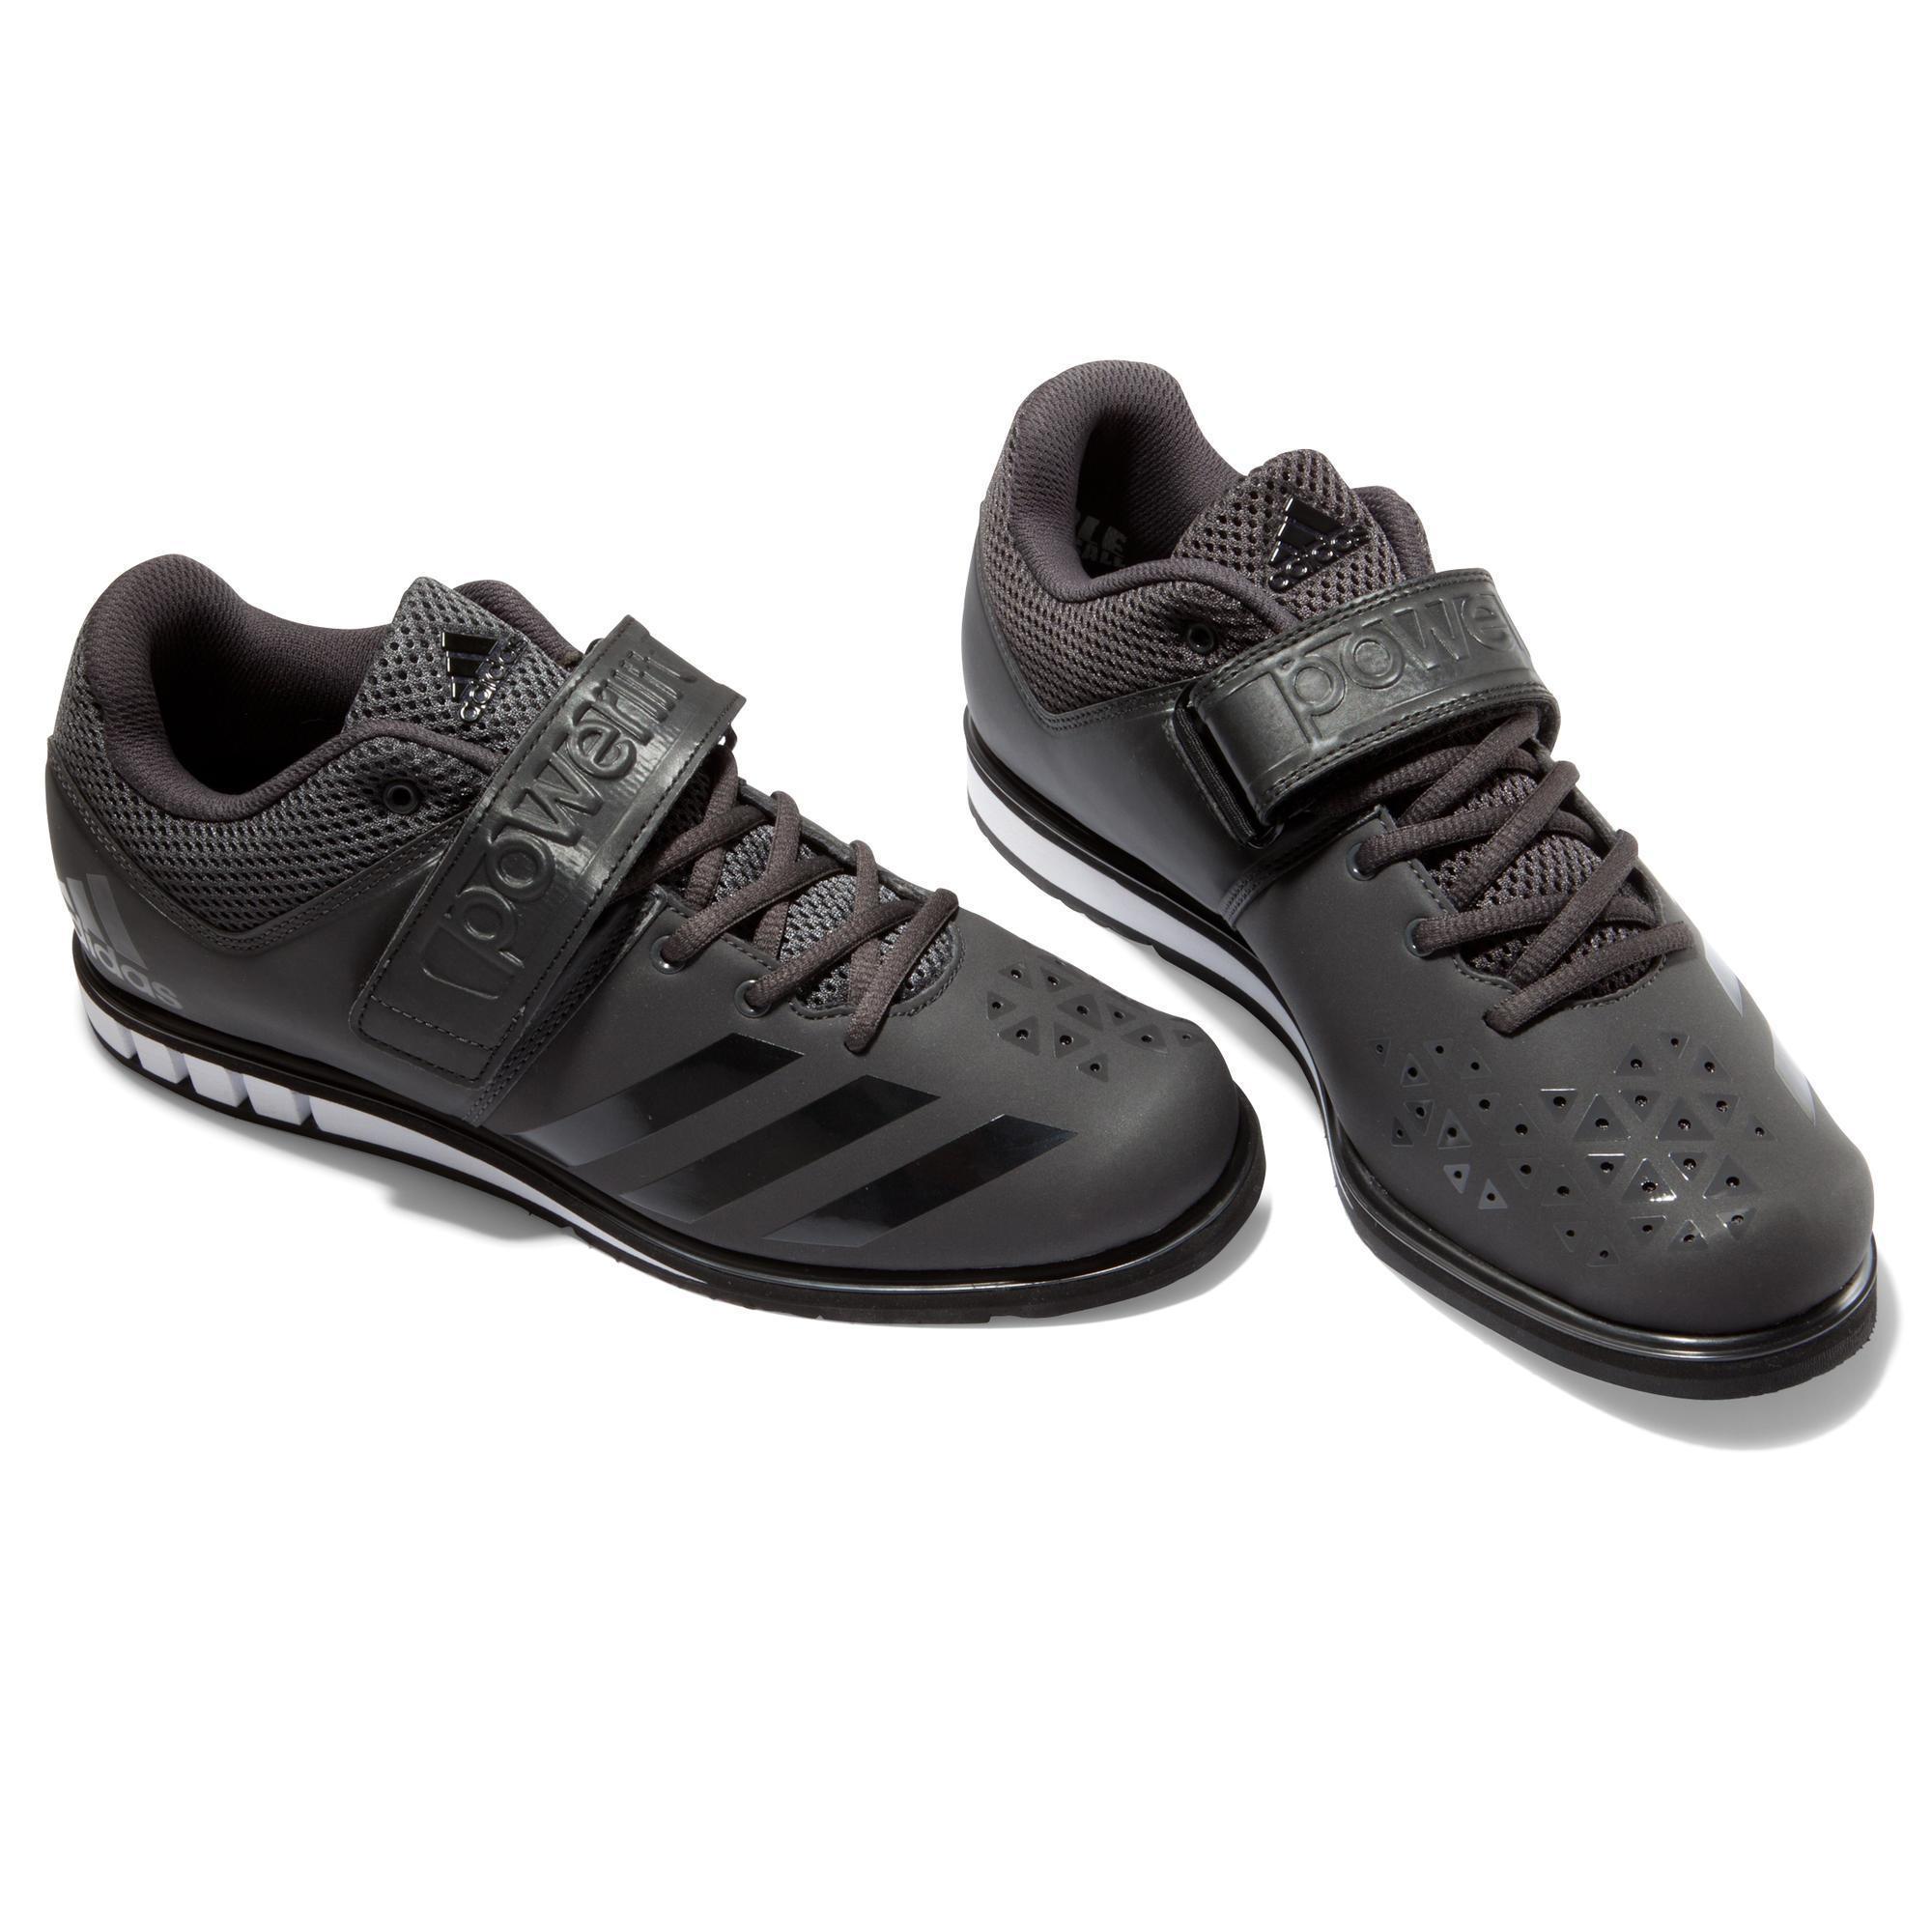 quality design 4f557 8a6be 3 1 Power Lift Adidas Decathlon Haltérophilie Chaussure n1IHqH6RA